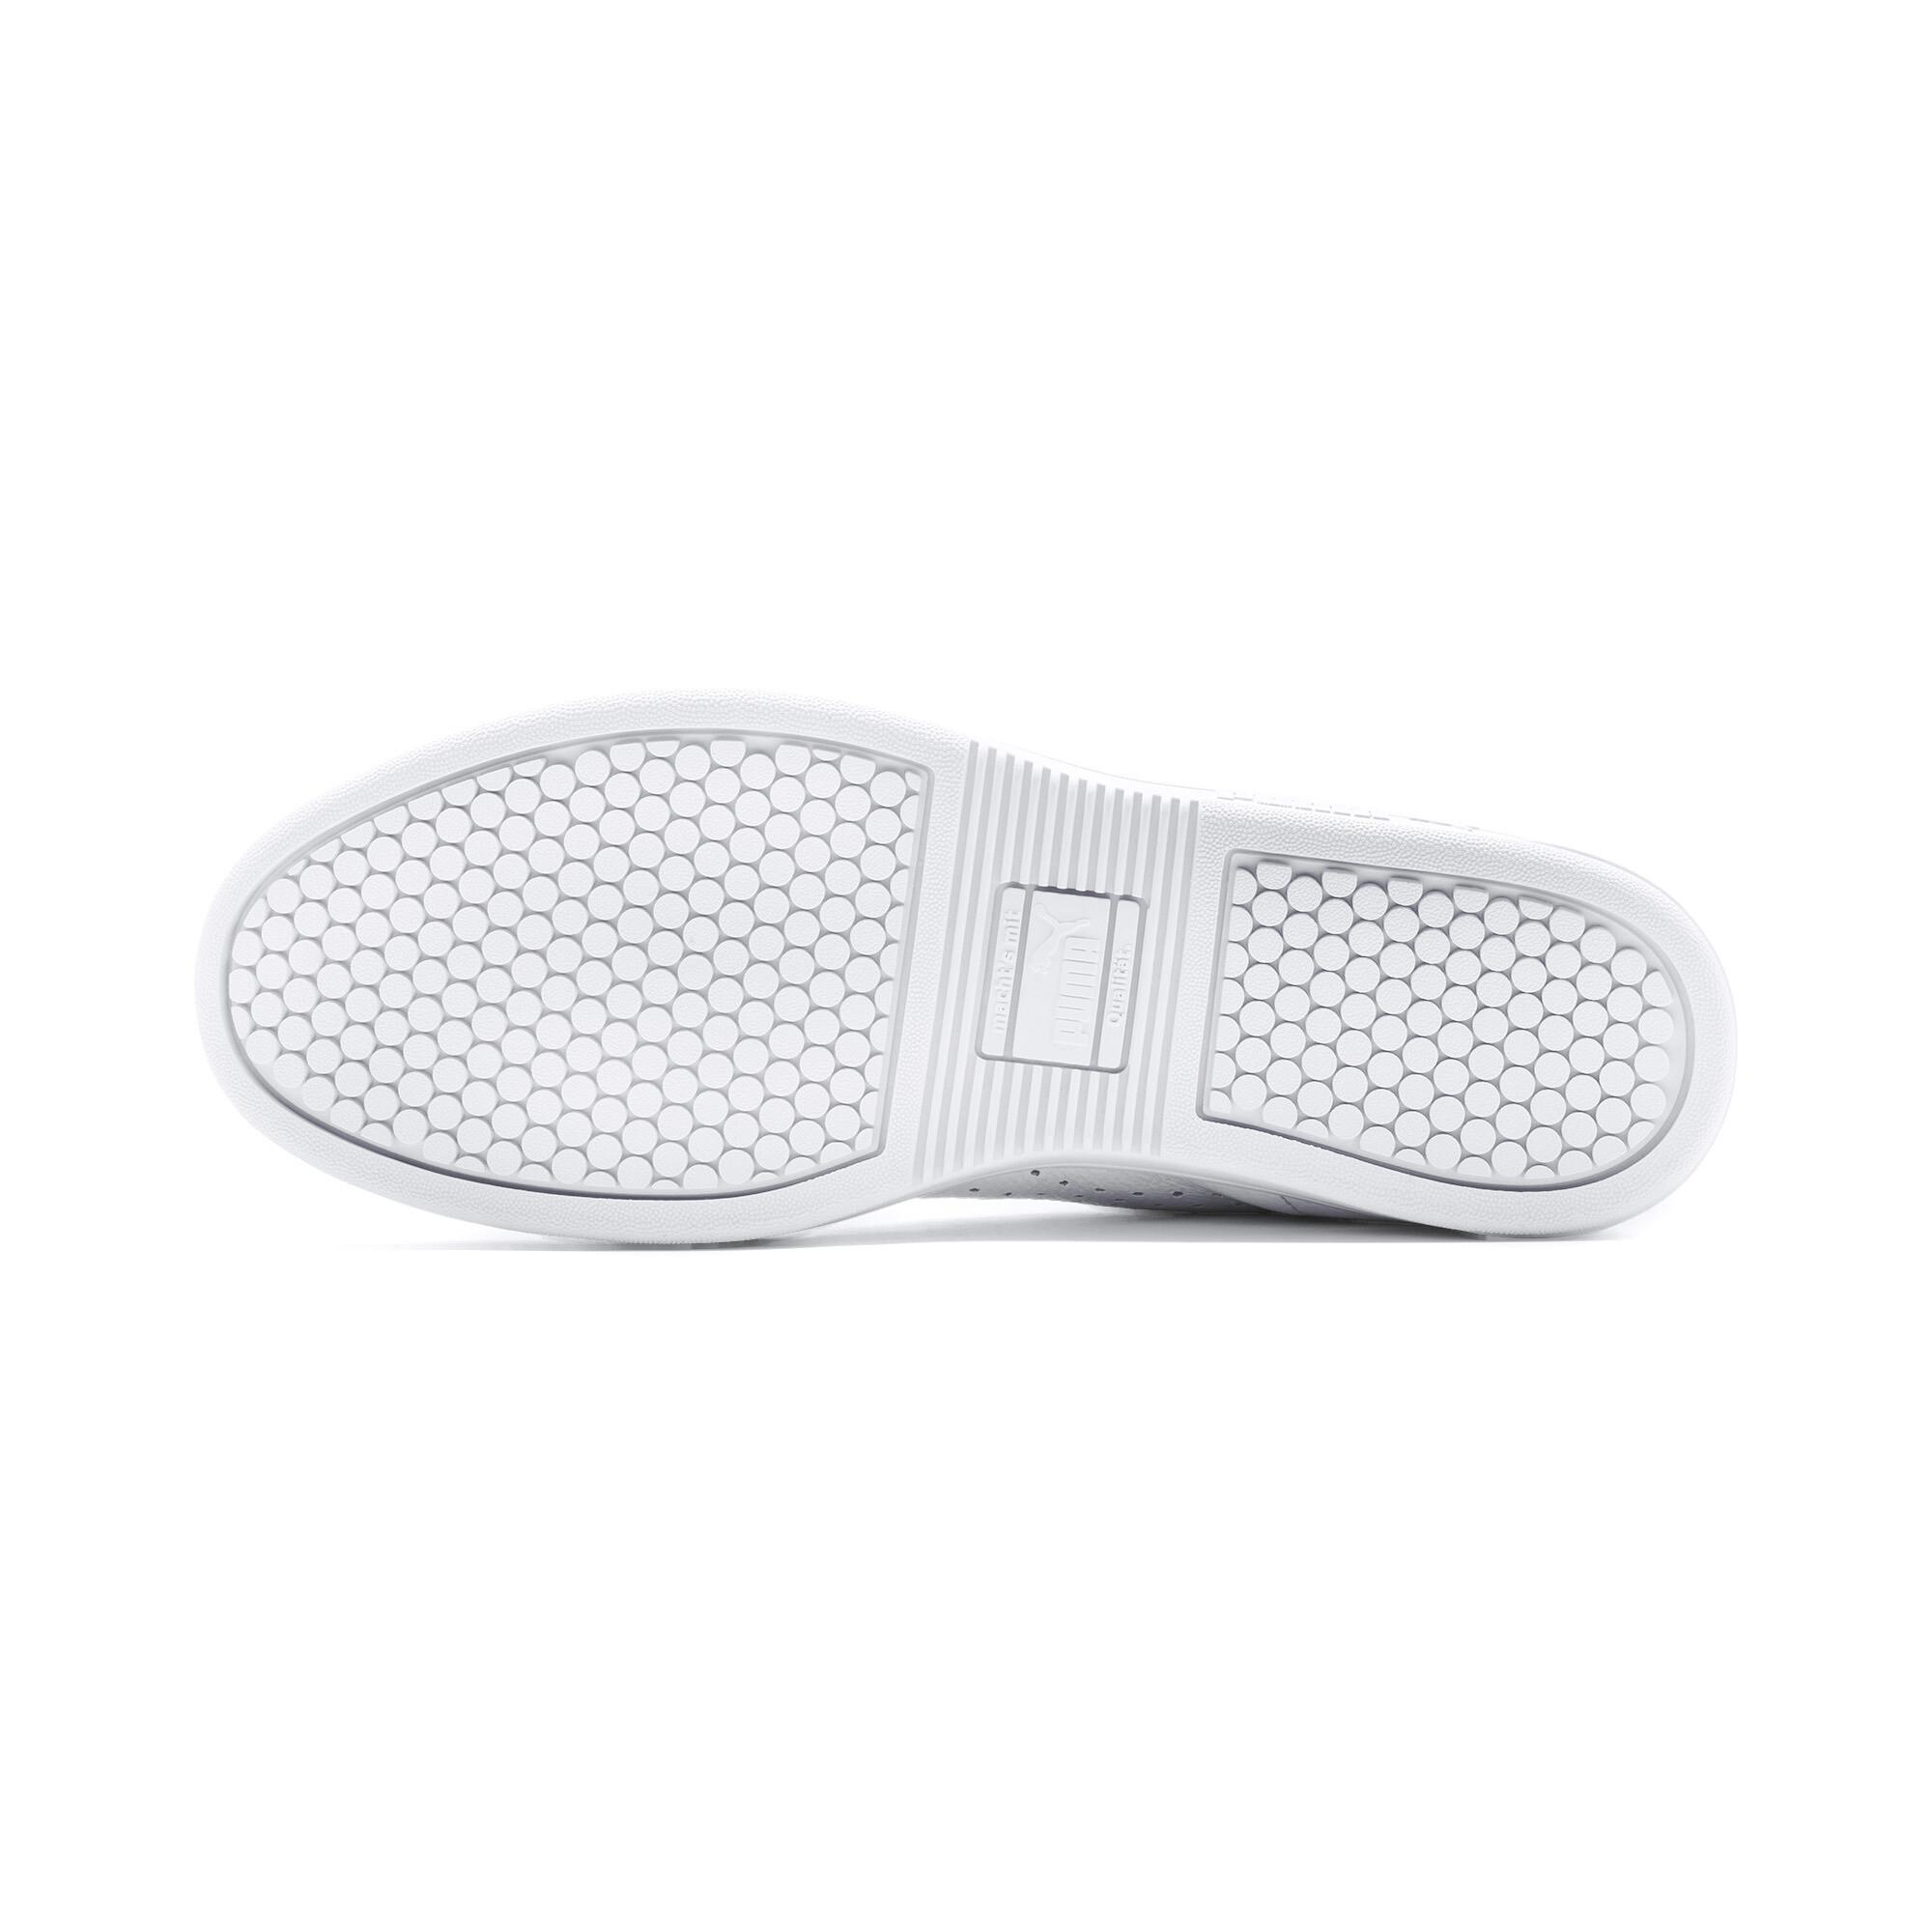 PUMA-Court-Star-Men-039-s-Sneakers-Unisex-Shoe-Sport-Classics thumbnail 6